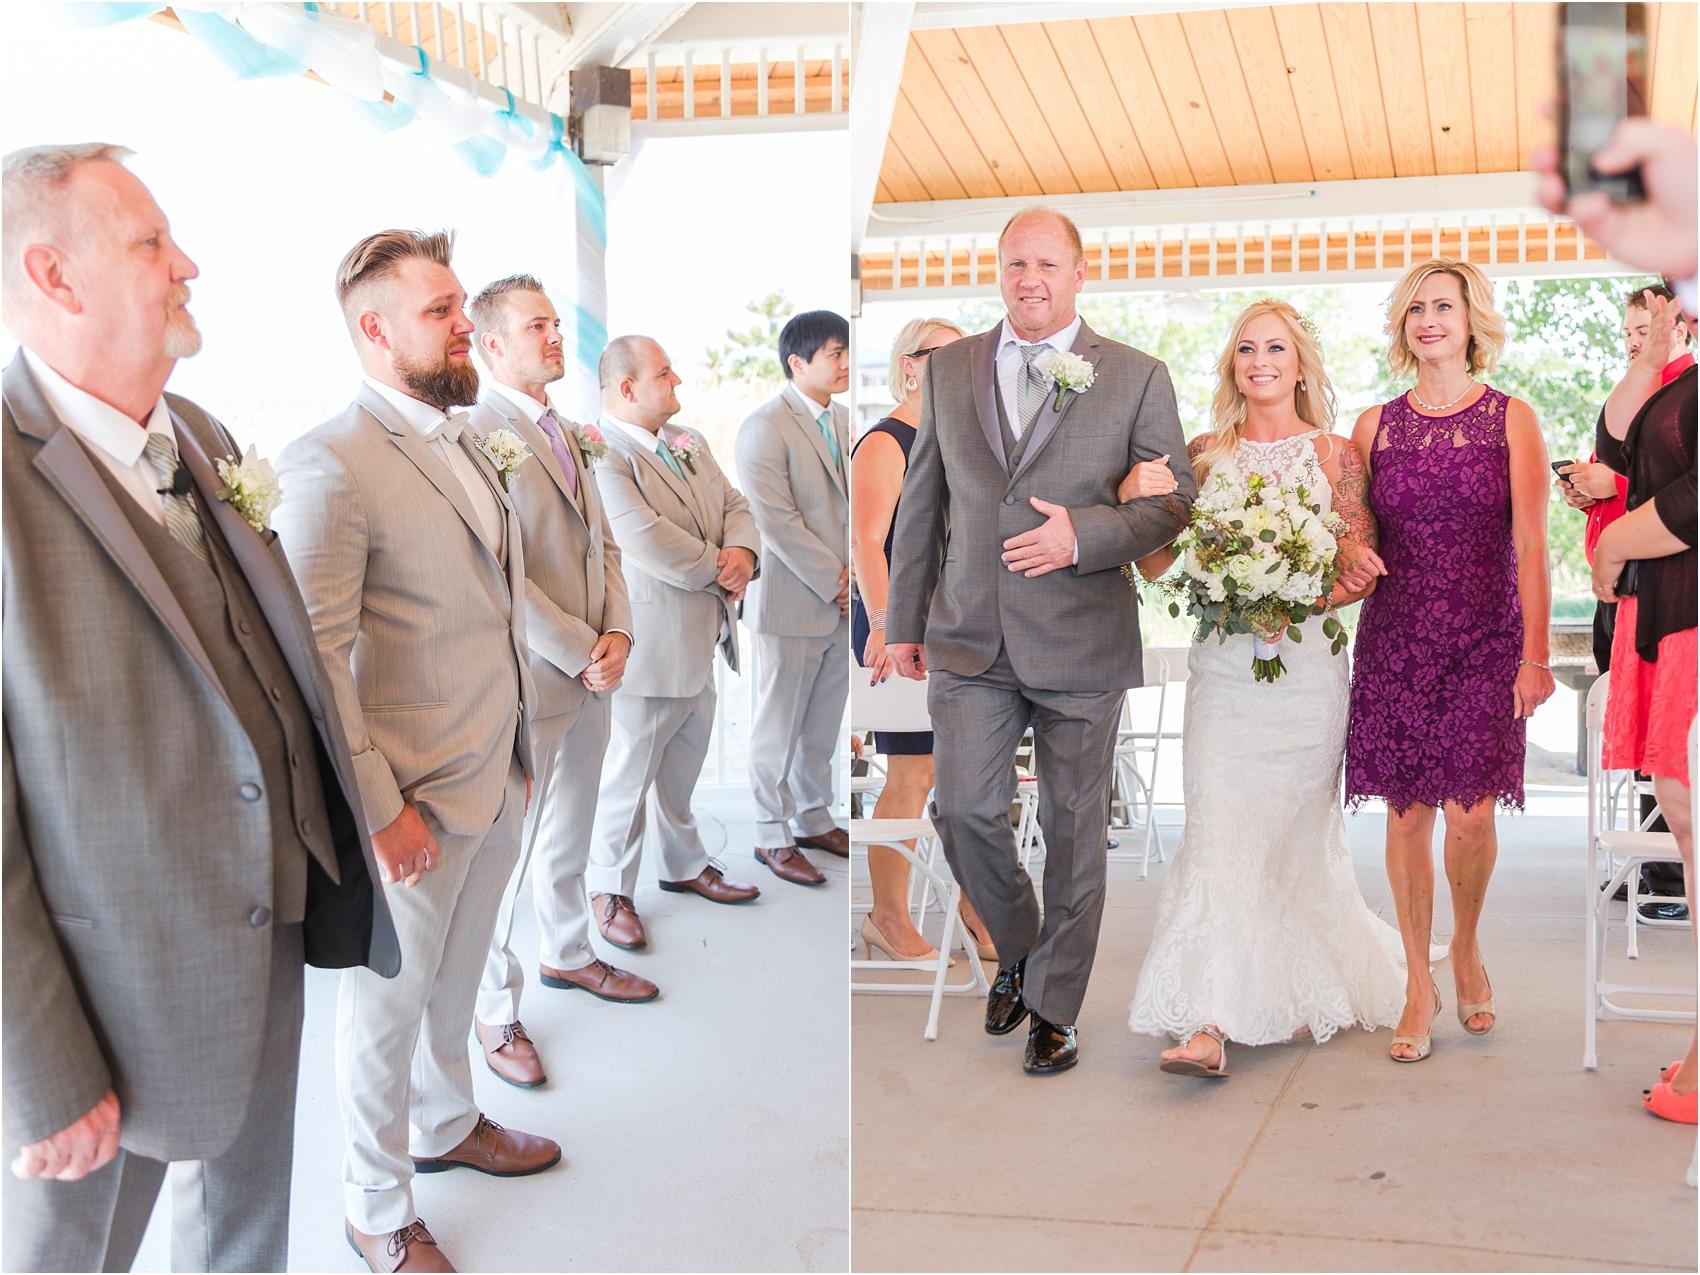 fun-whimsical-beach-wedding-photos-in-st-joseph-michigan-by-courtney-carolyn-photography_0064.jpg